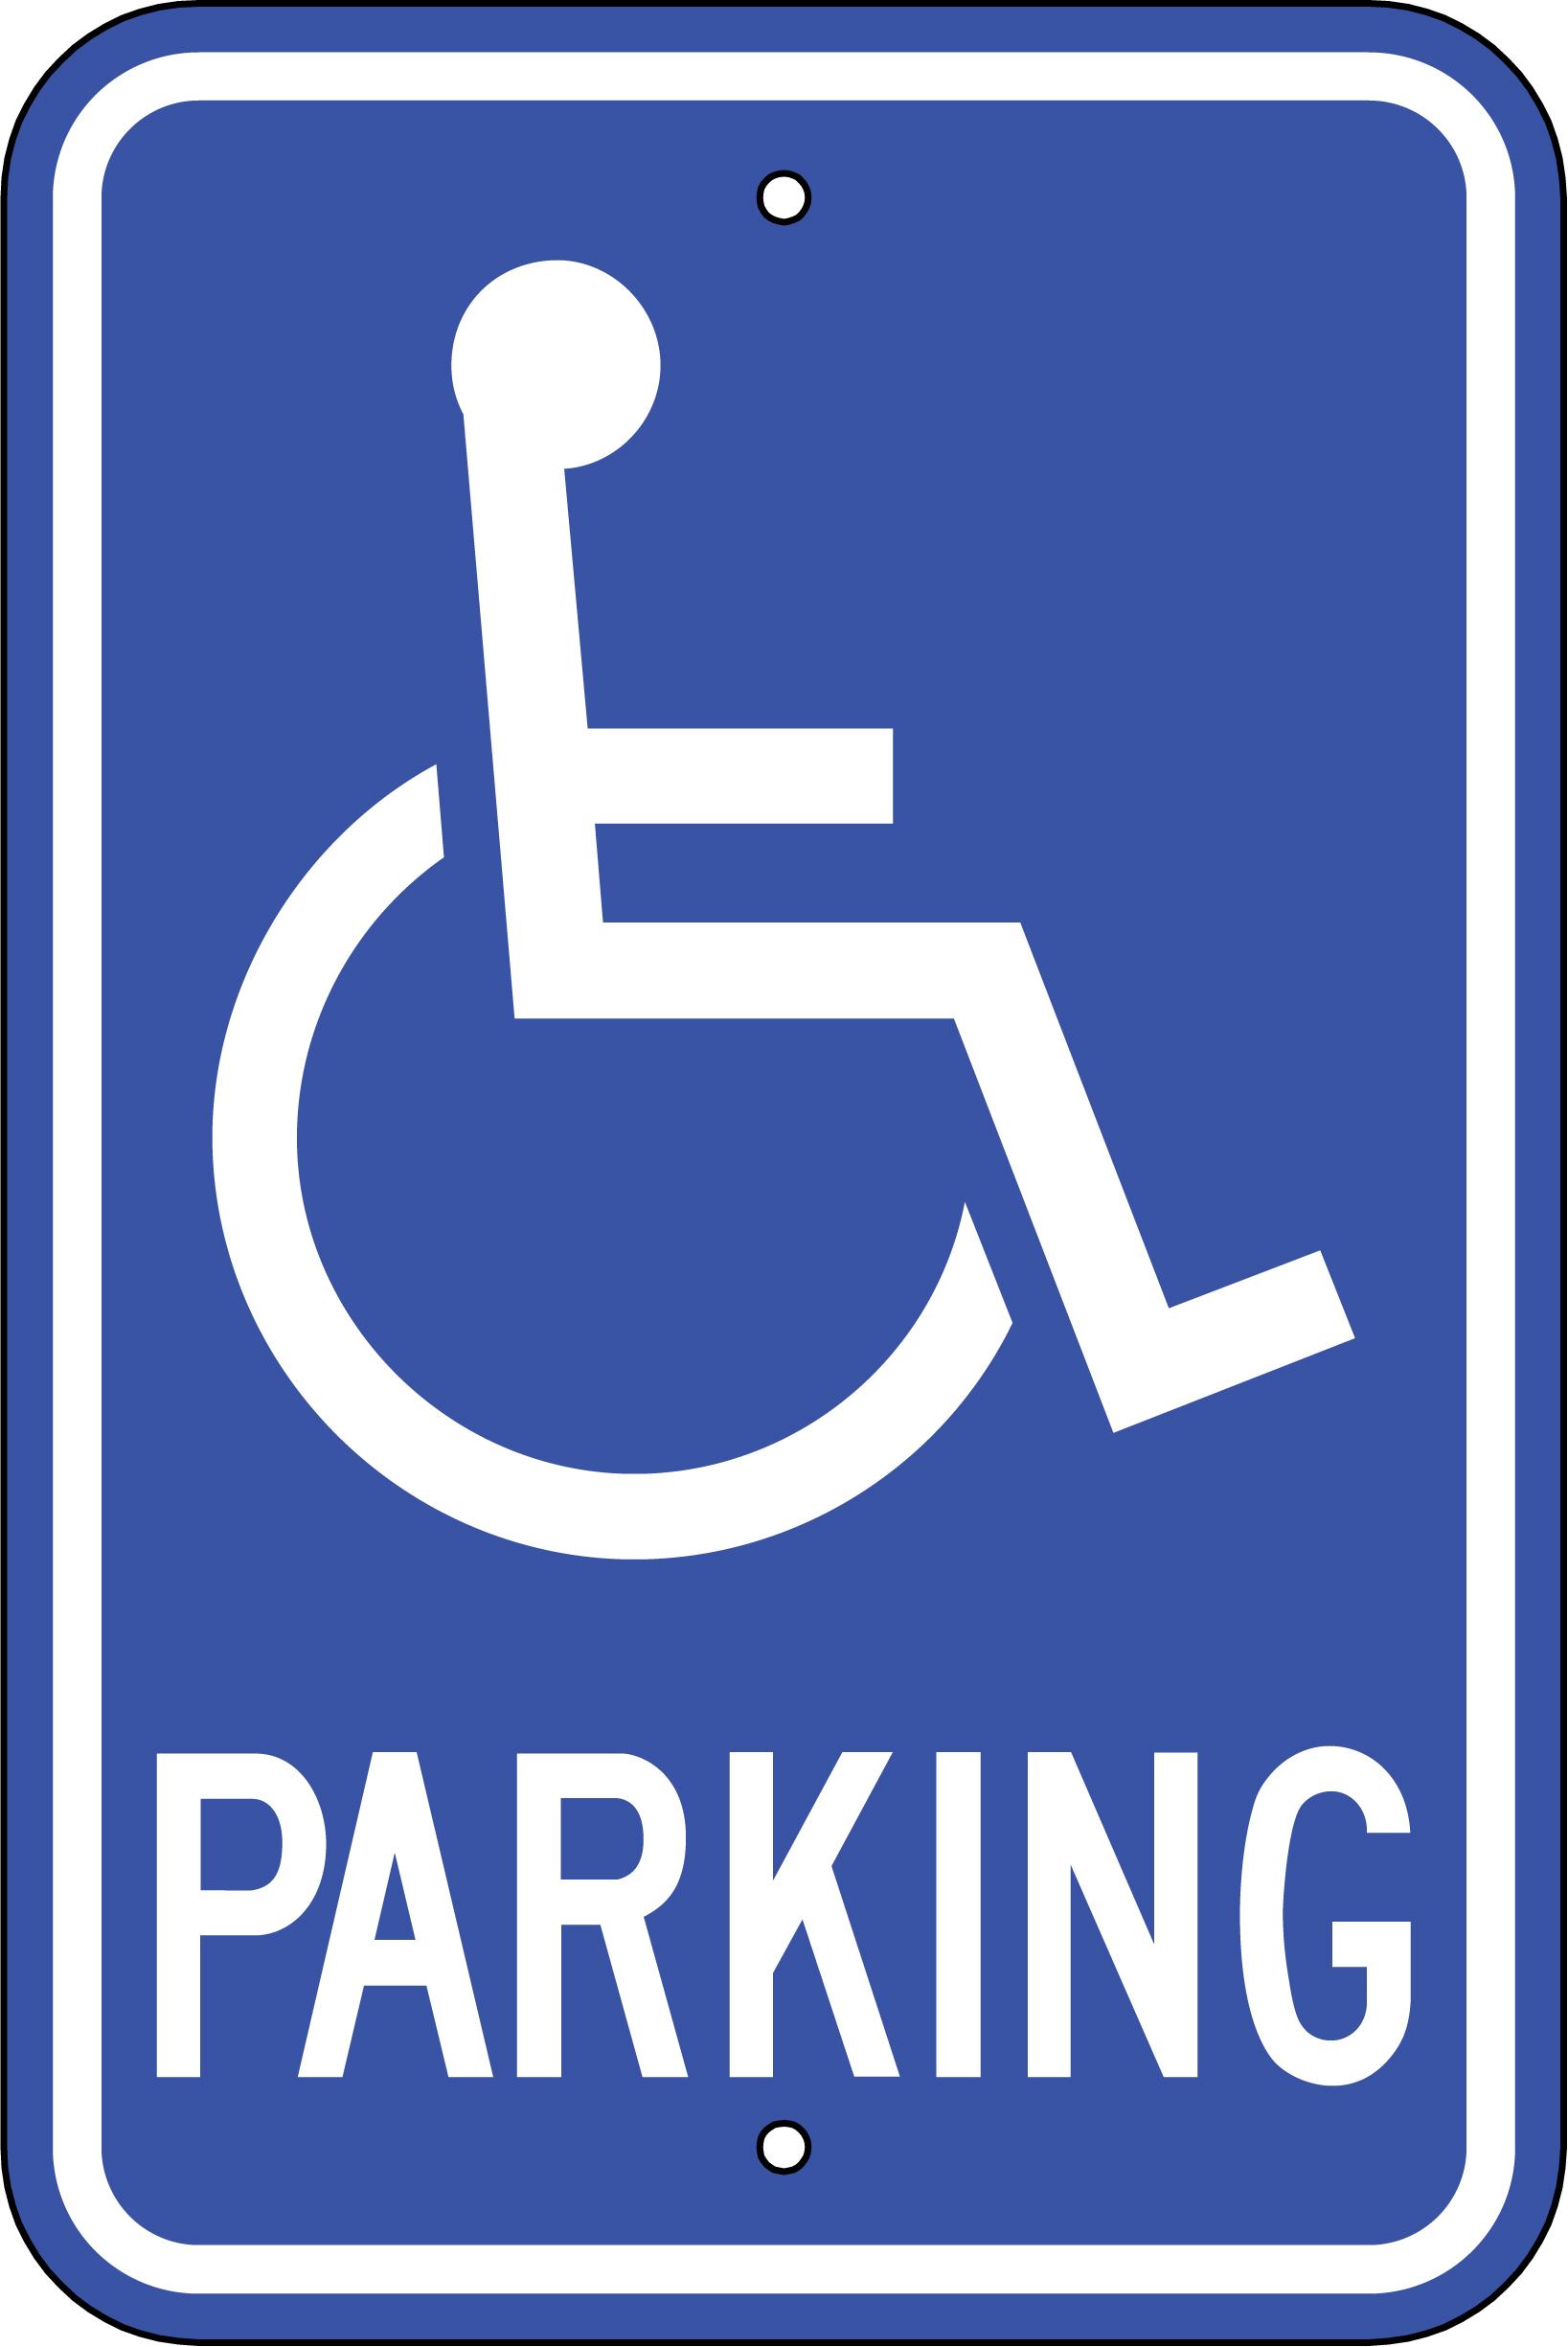 Handicap Parking Signs Printable - Cliparts.co